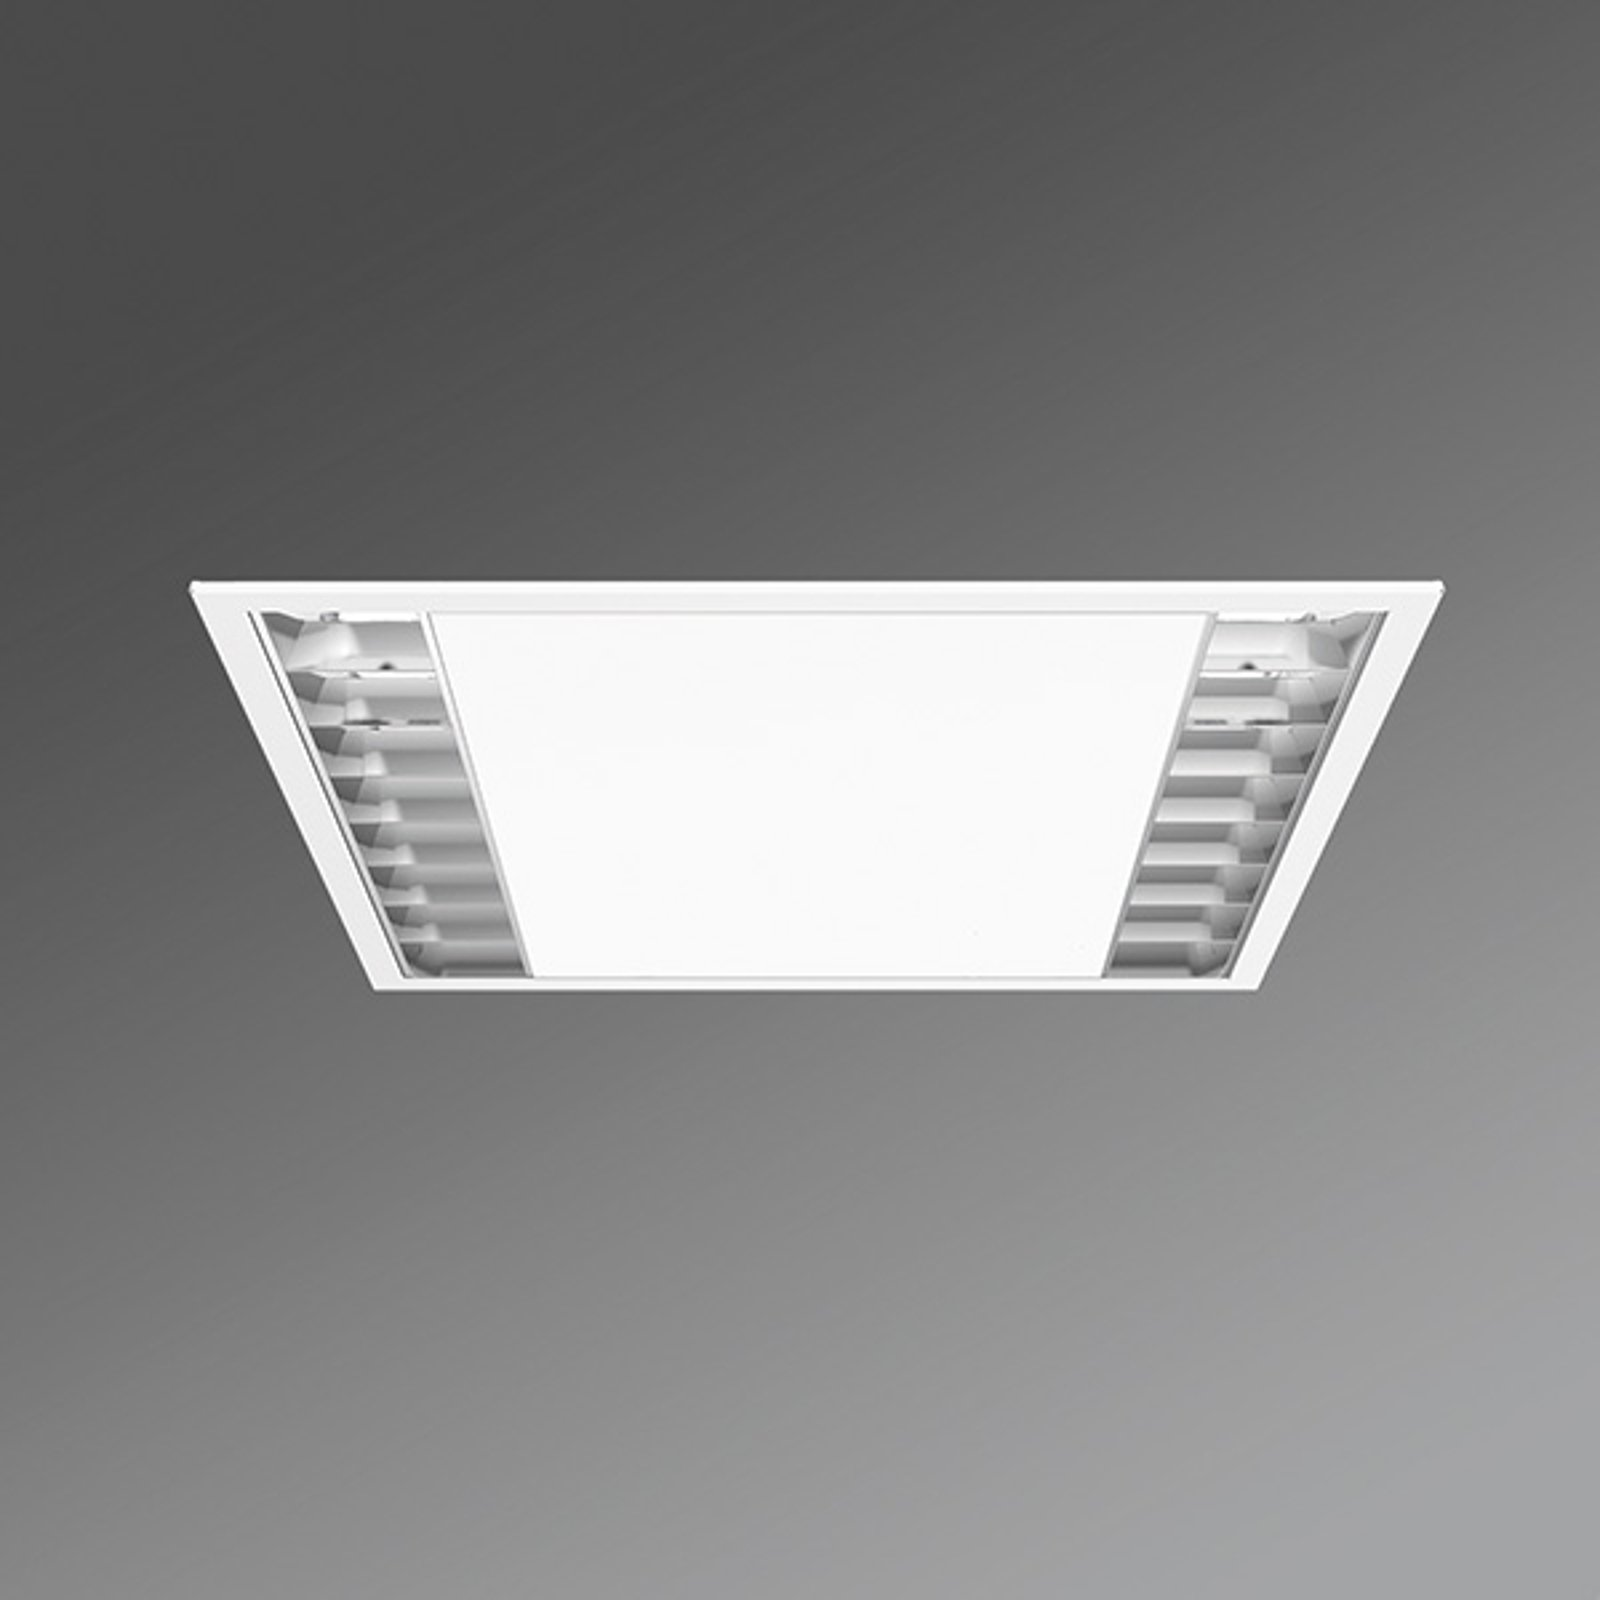 LED-downlight kontor UEX/625 parabolraster